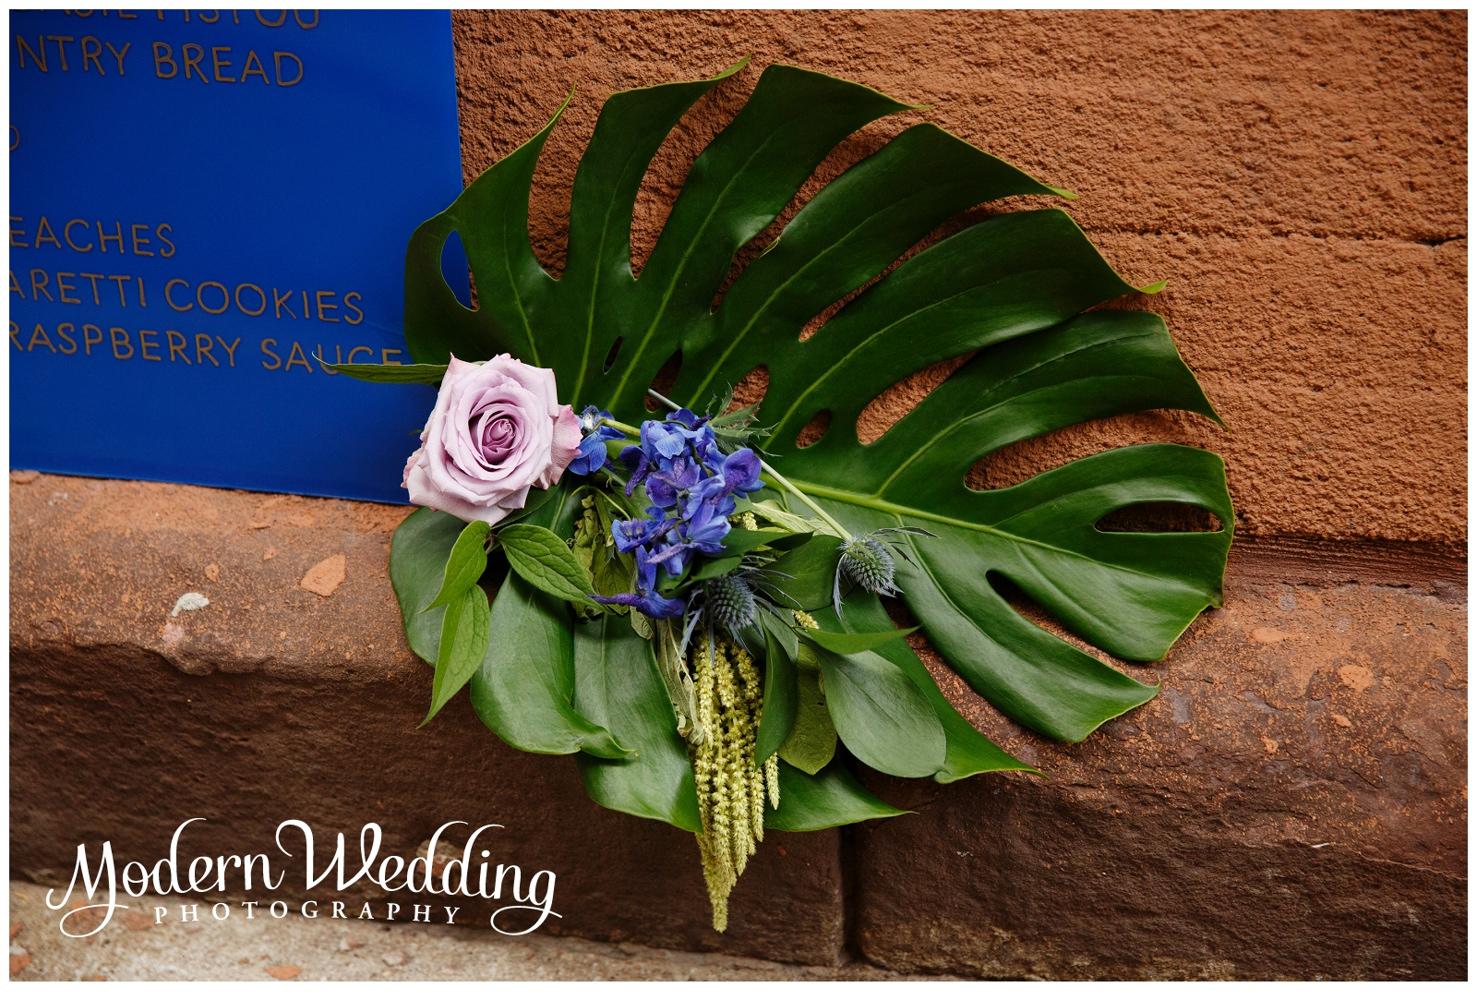 Modern Wedding Photography 30